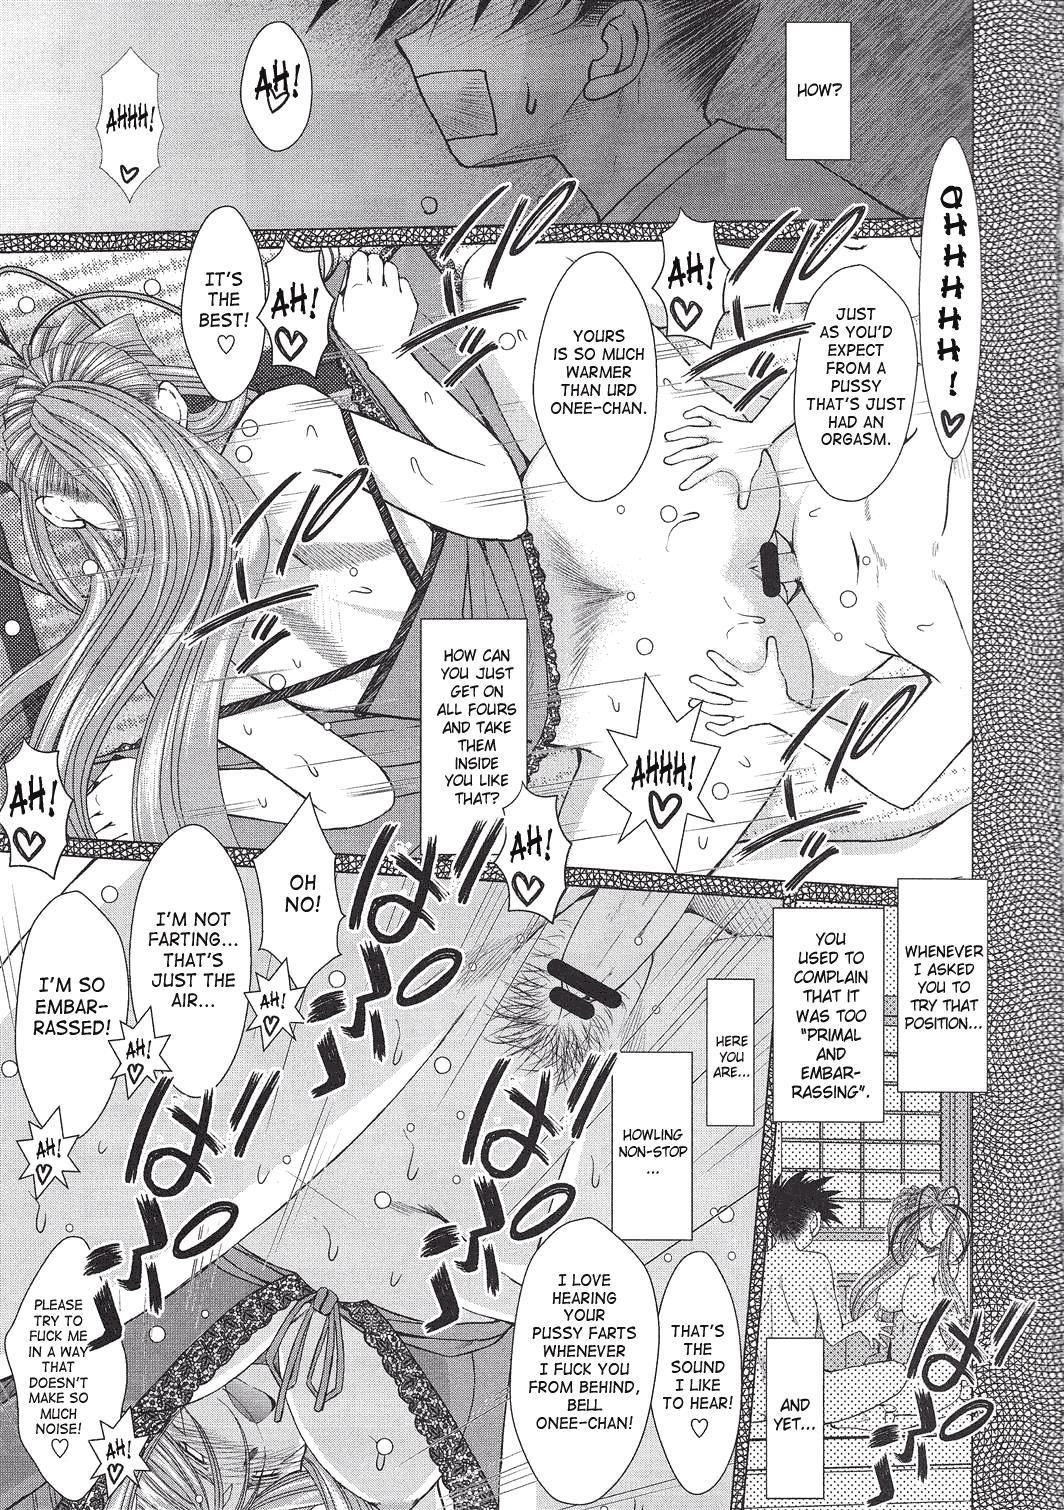 (C63) [CIRCLE OUTERWORLD (Chiba Shuusaku)] Midgard  (Ah! My Goddess) complete [eng] 542